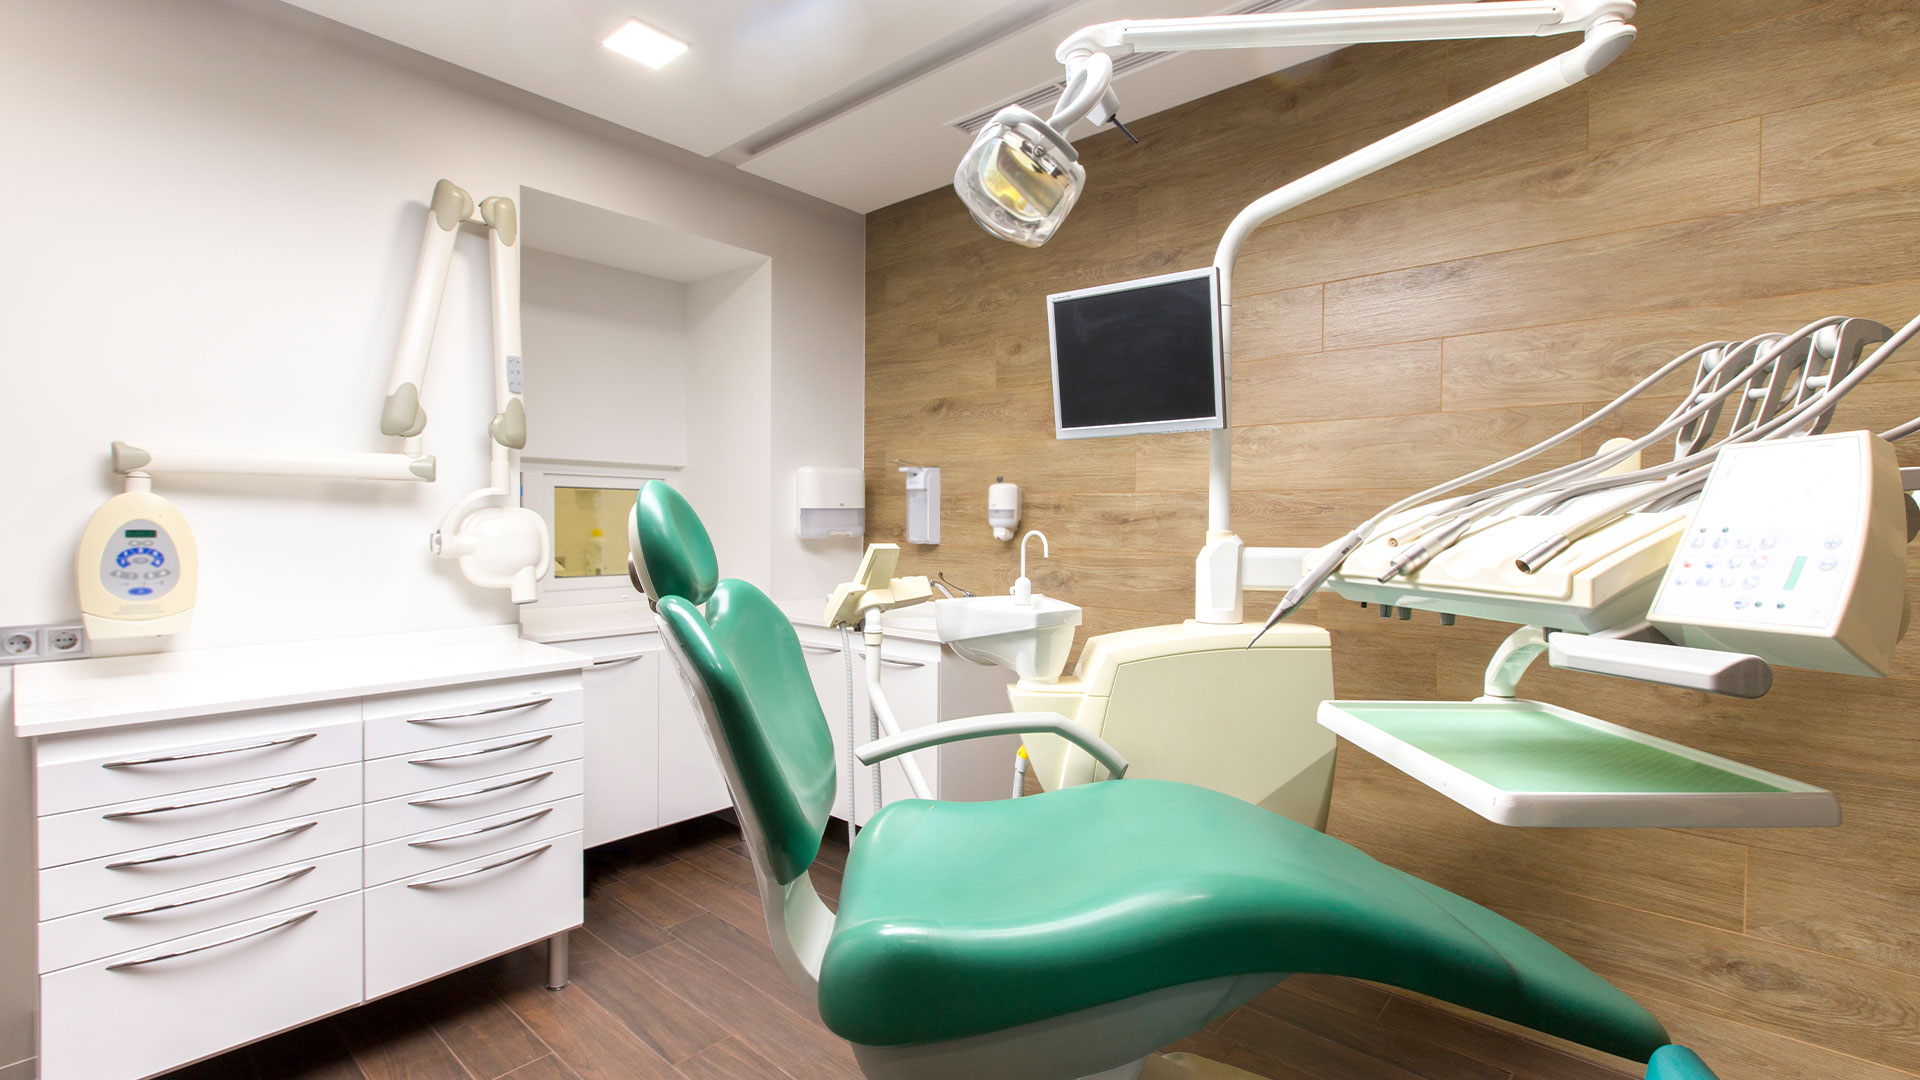 commercial cleaning kelowna penticton vernon kamloops health care